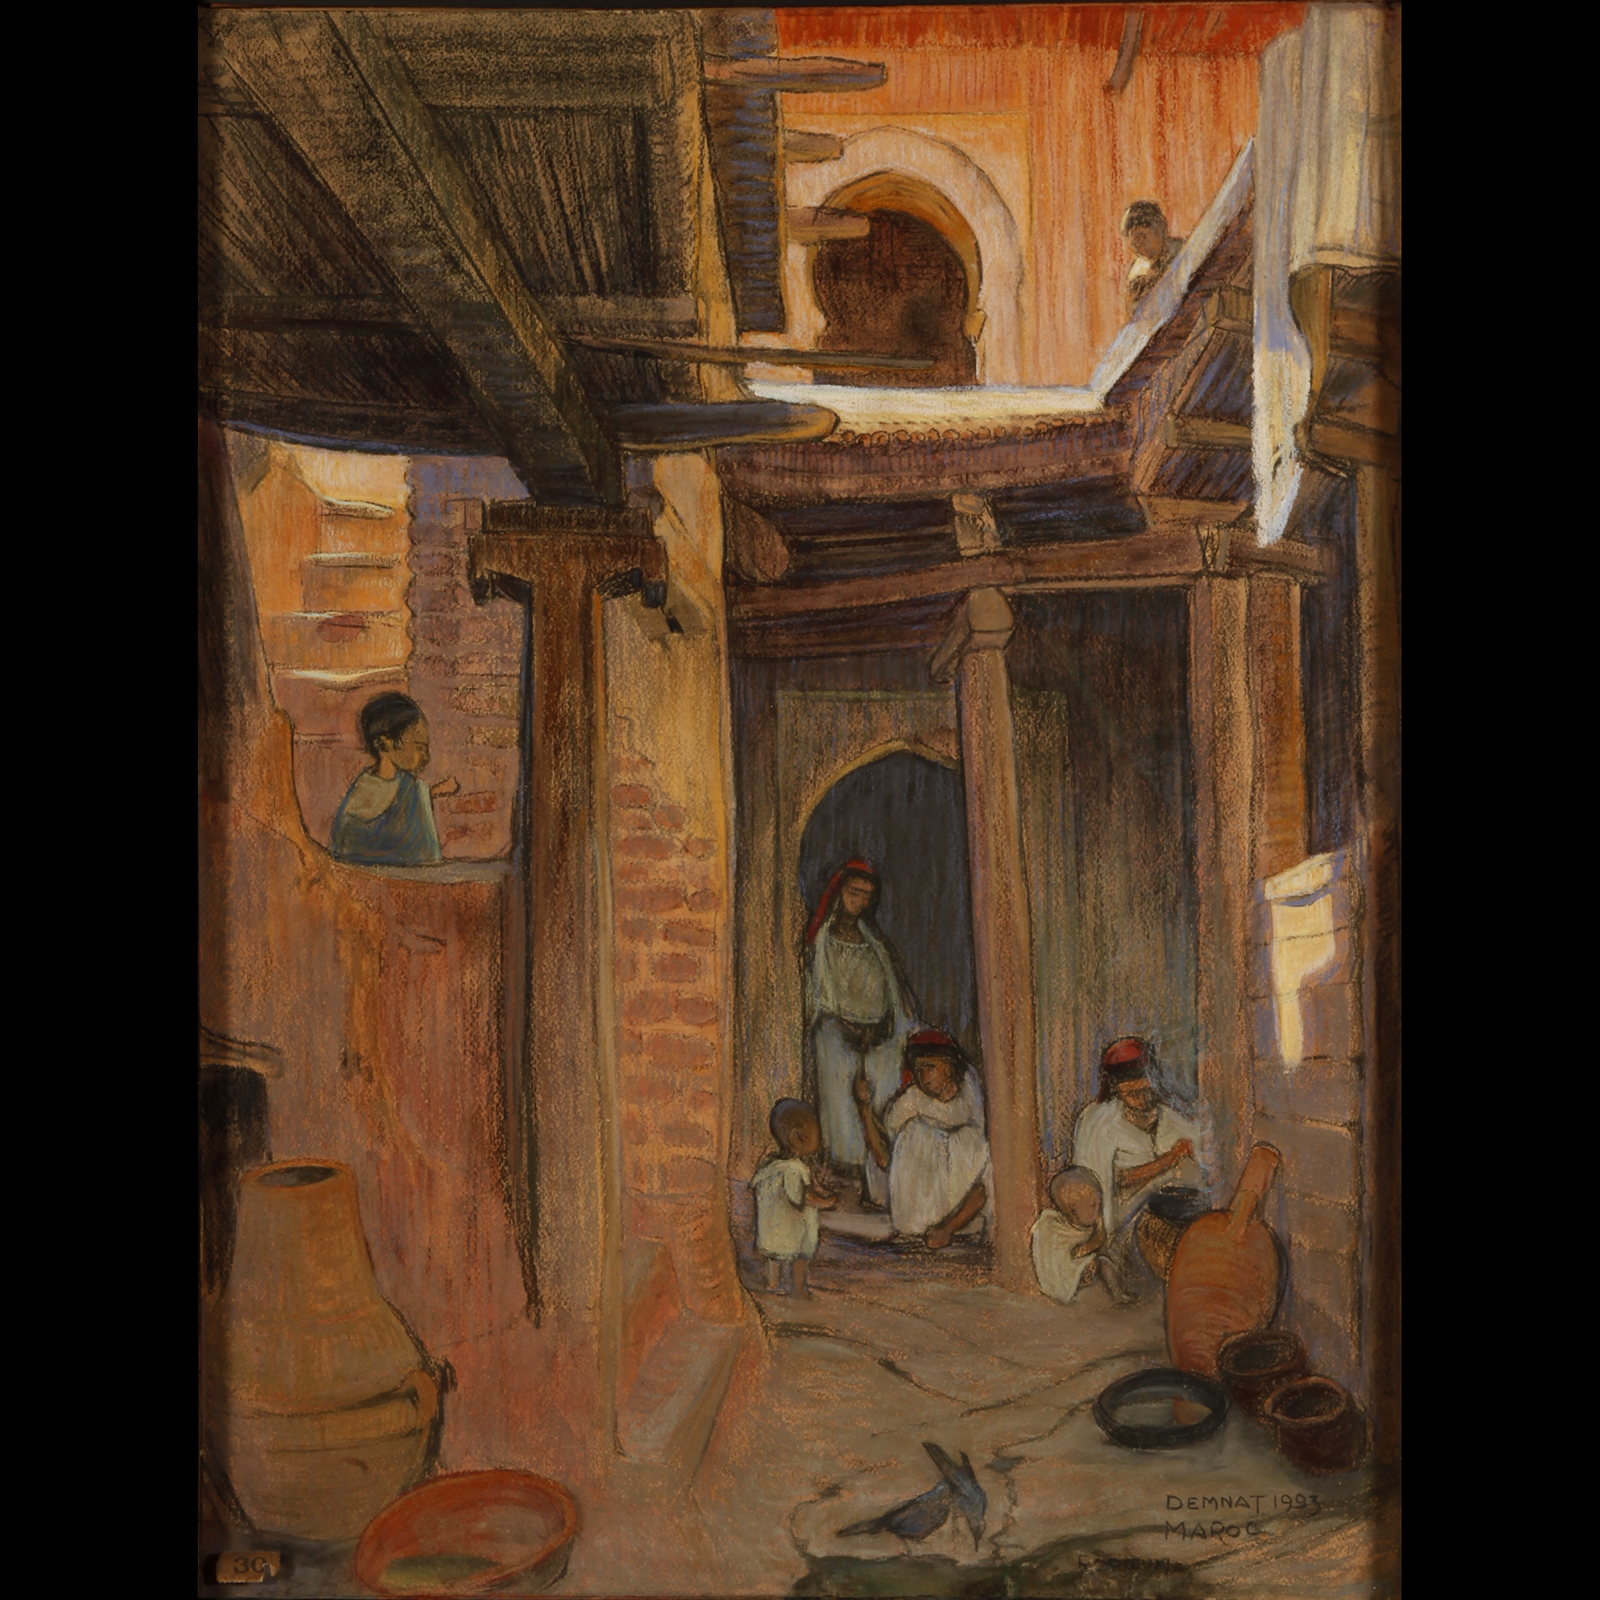 Rodieux Maurice - Demnat Maroc